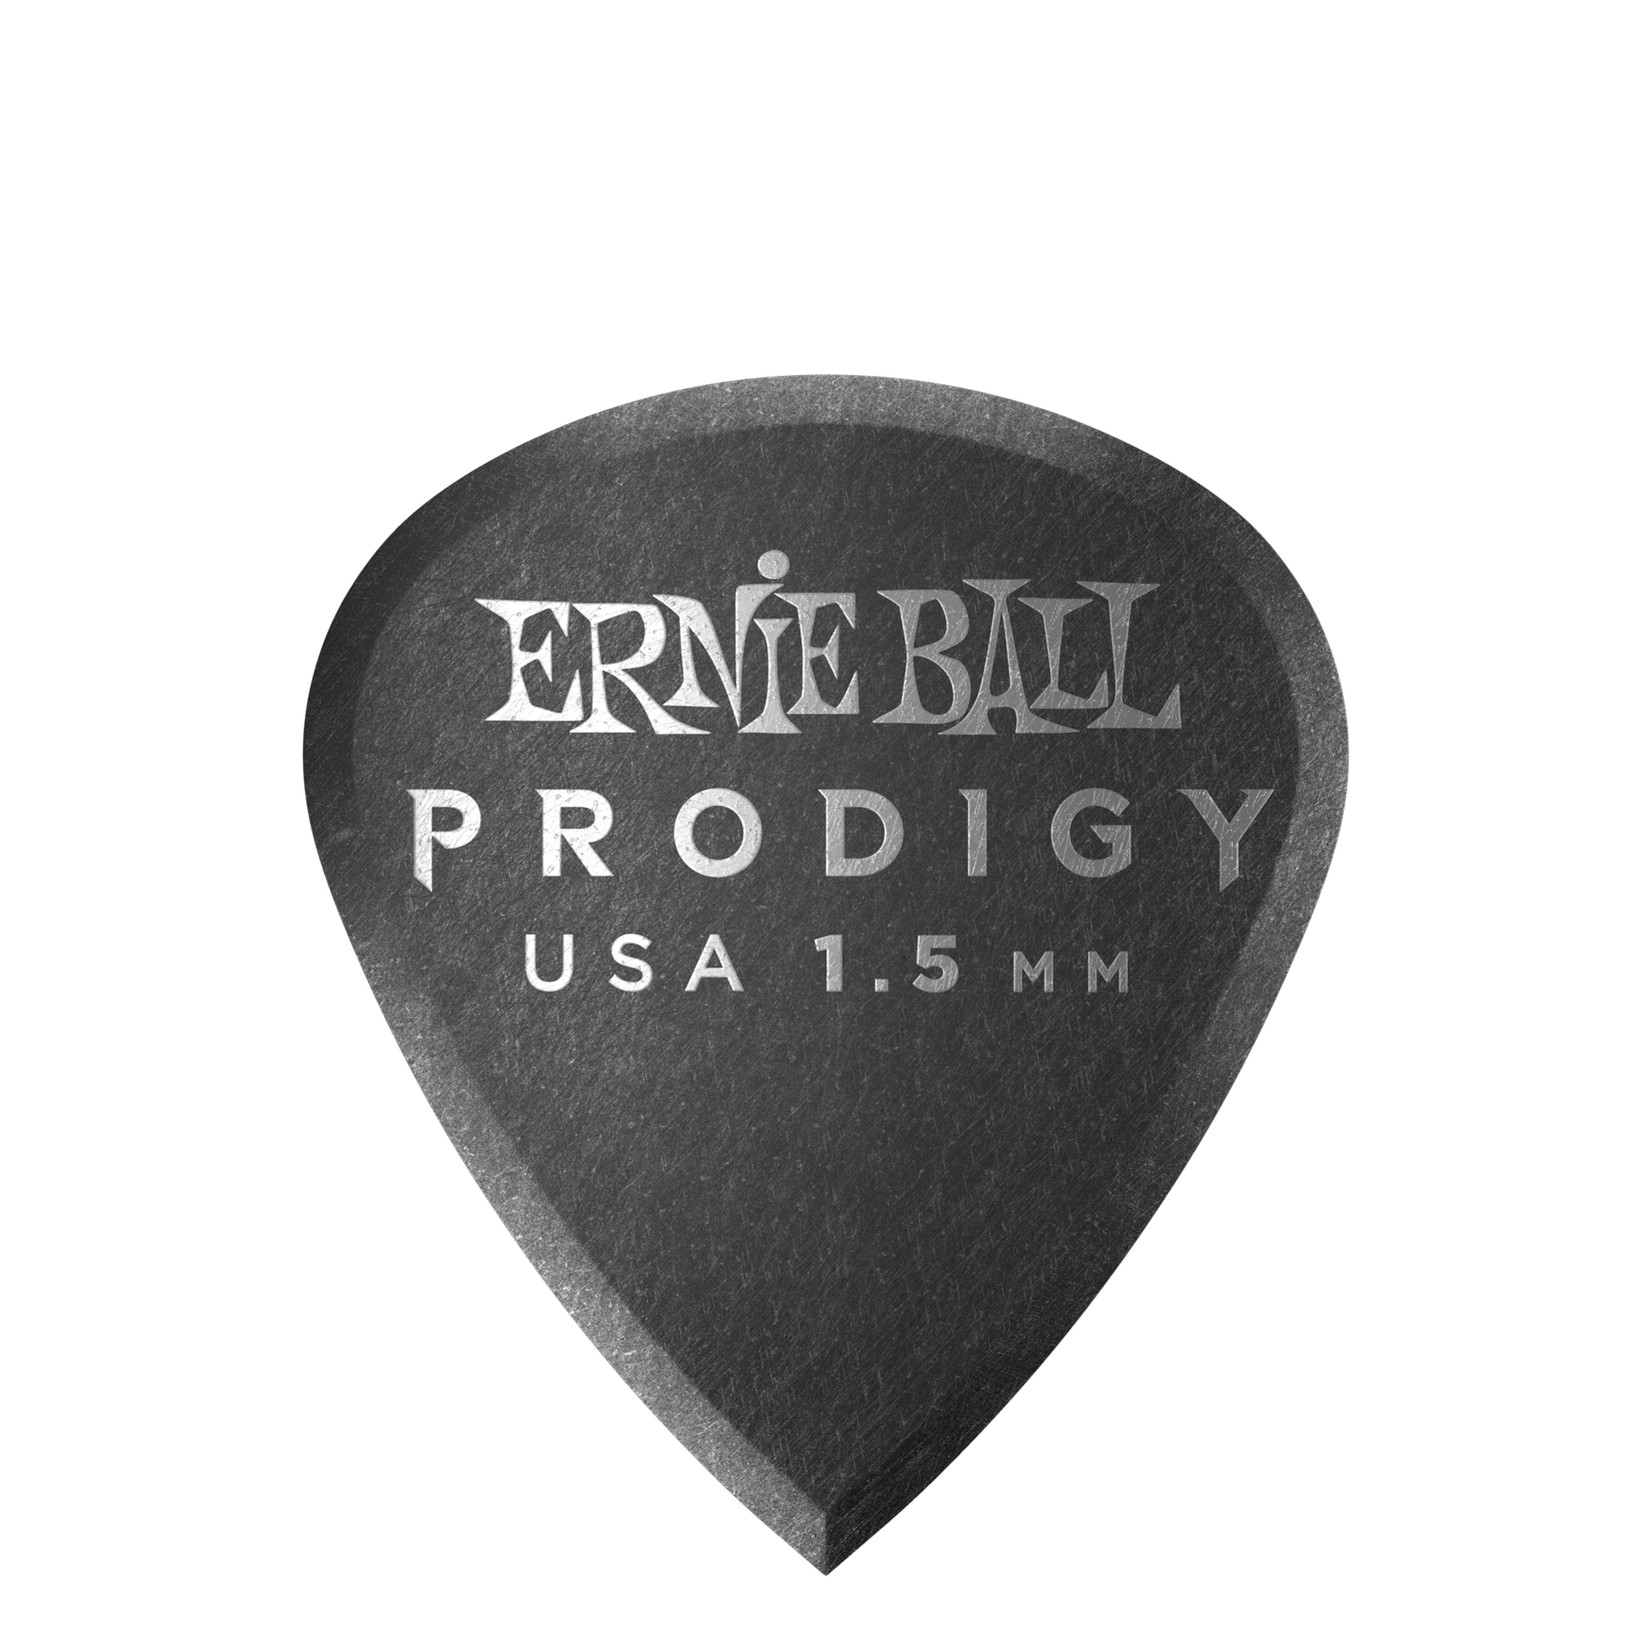 Ernie Ball Ernie Ball 1.5mm Black Mini Prodigy Picks 6-pack